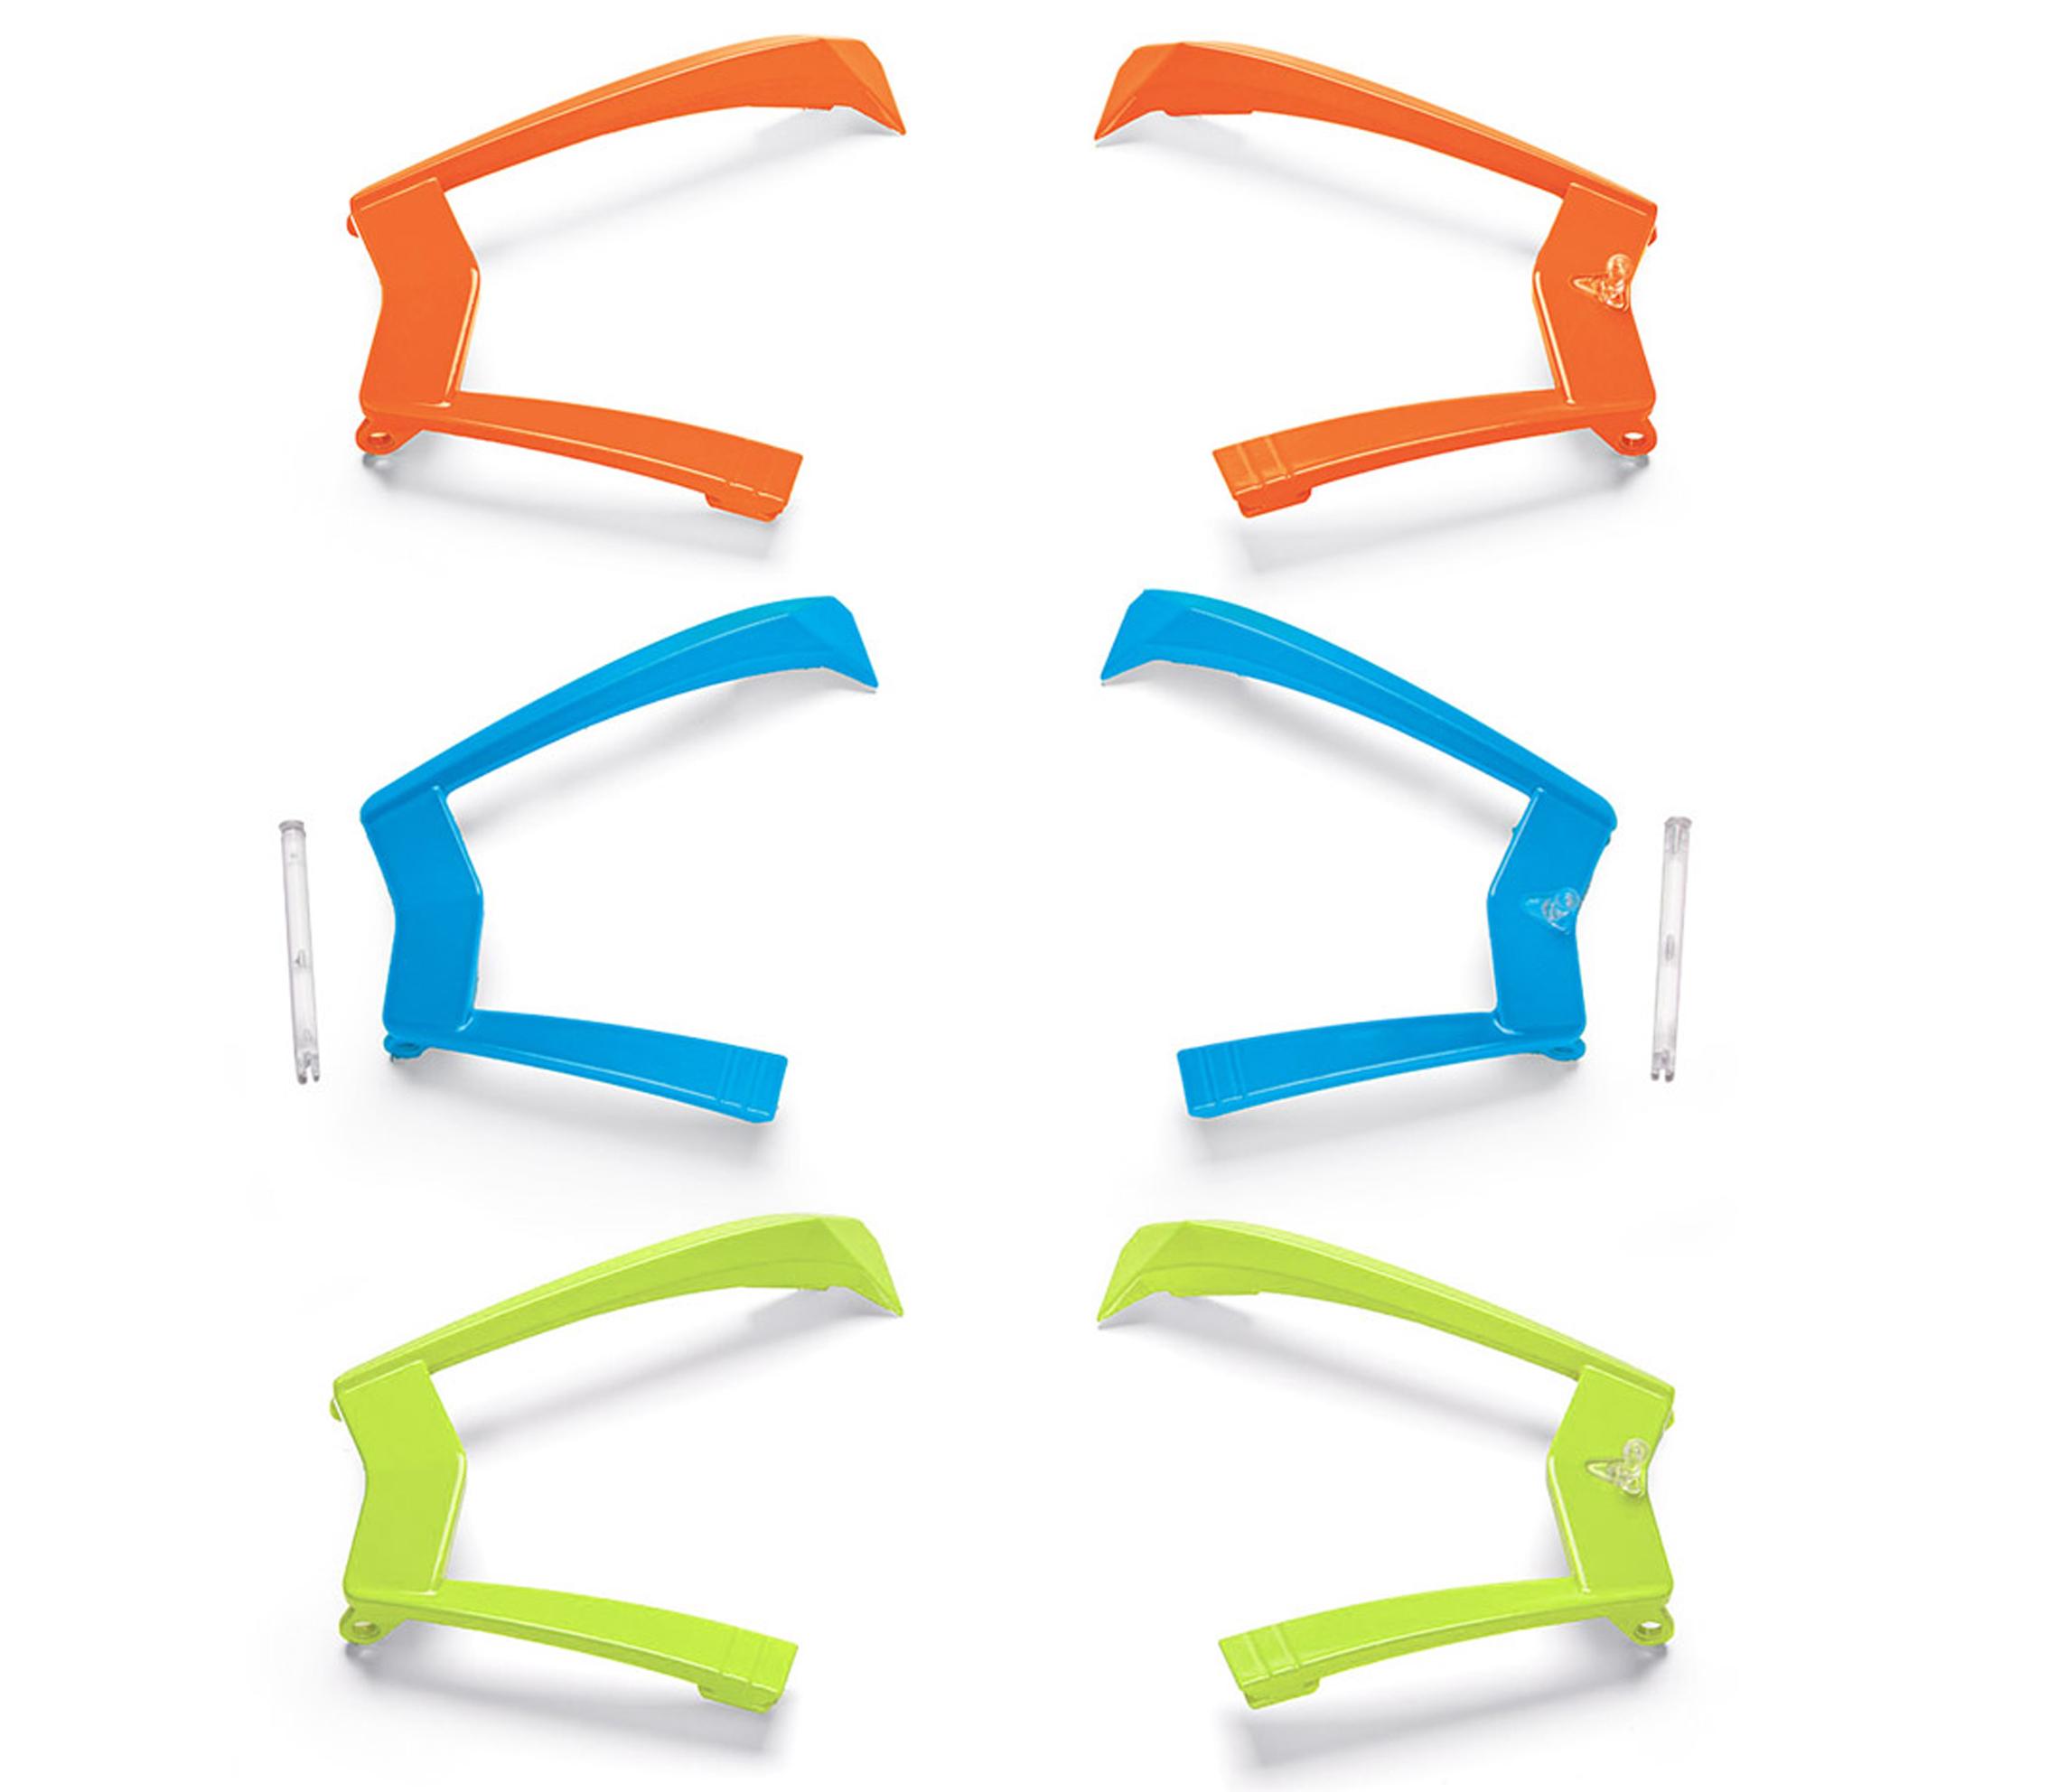 RIDING CLOWS(ライディング・クロウズ)用ピン付き クロウ ペイントモデル